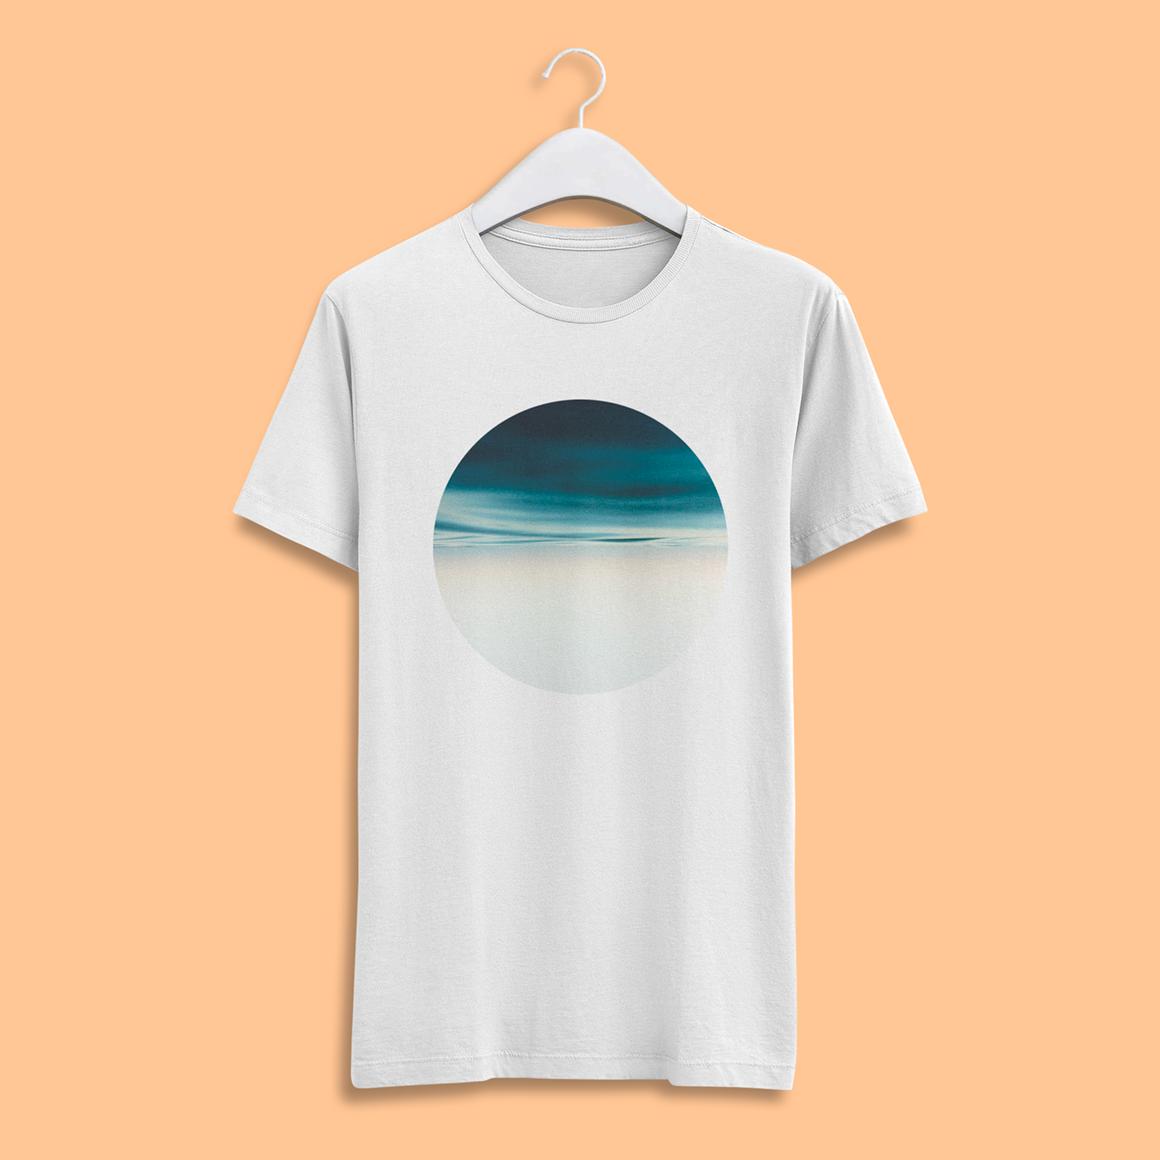 Download Free Realistic T-Shirt Mockup PSD on Behance Free Mockups